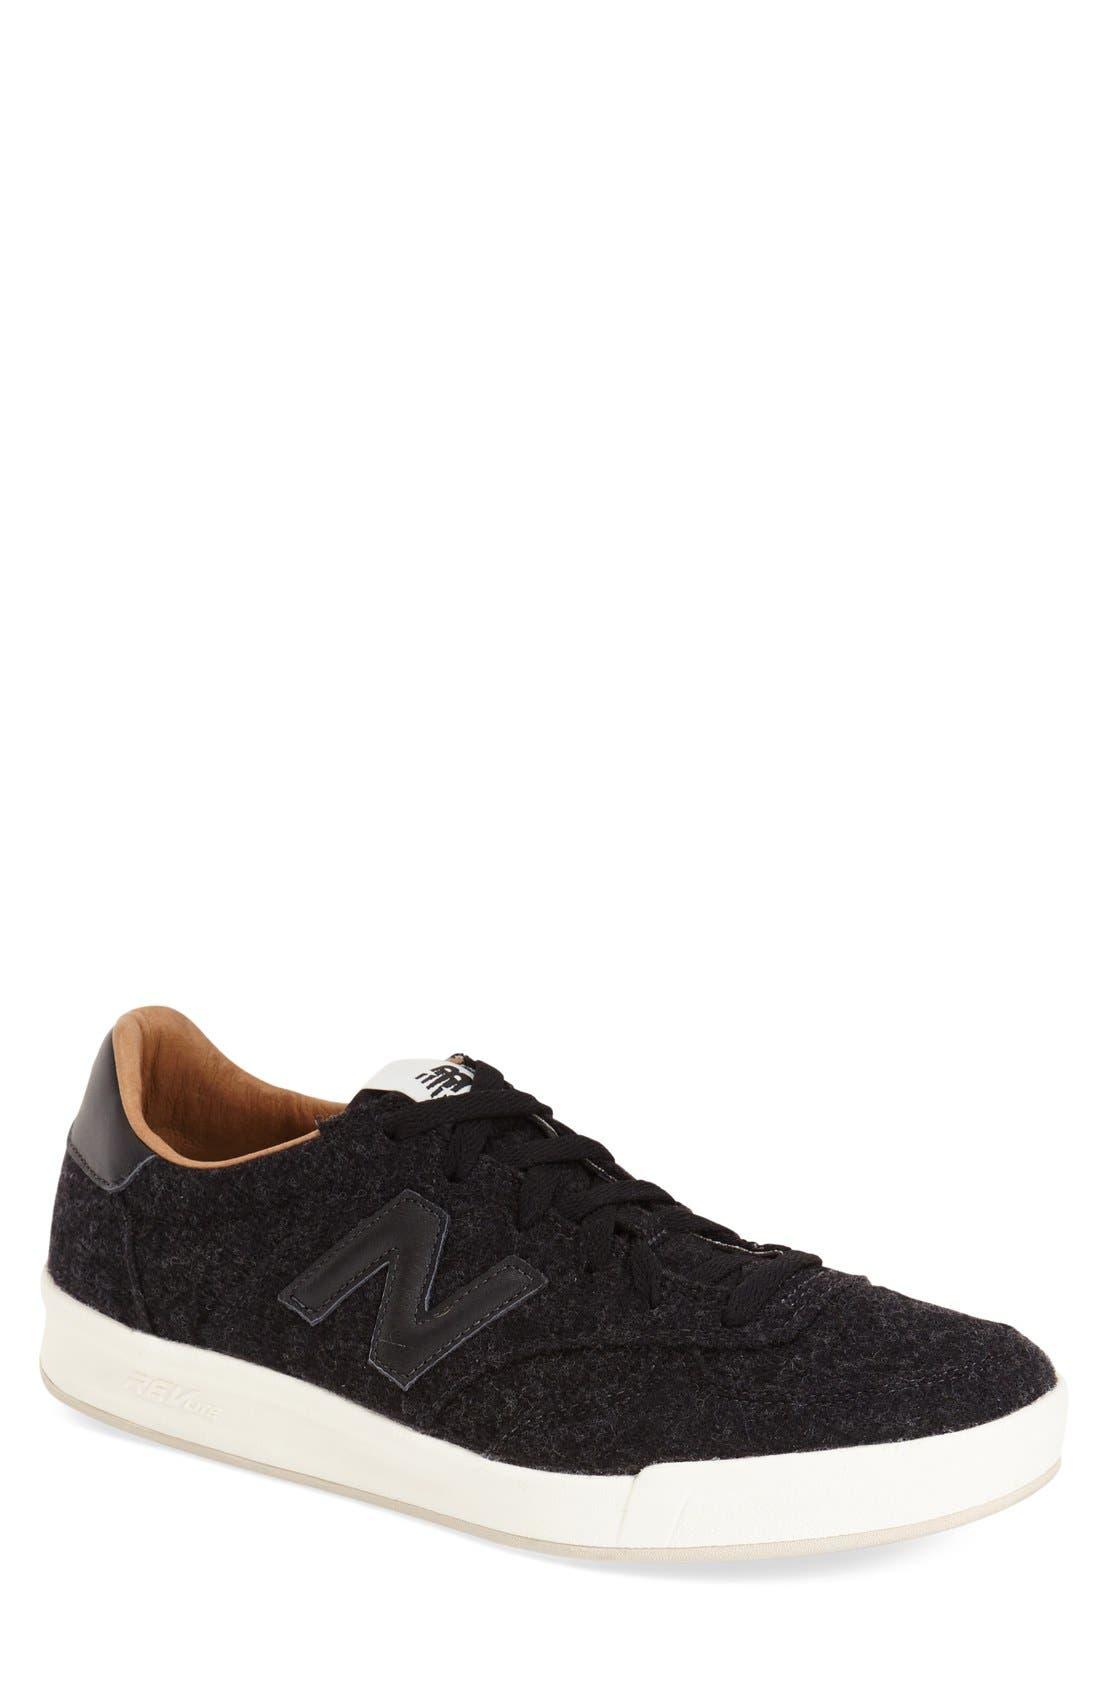 '300' Sneaker,                             Main thumbnail 1, color,                             001